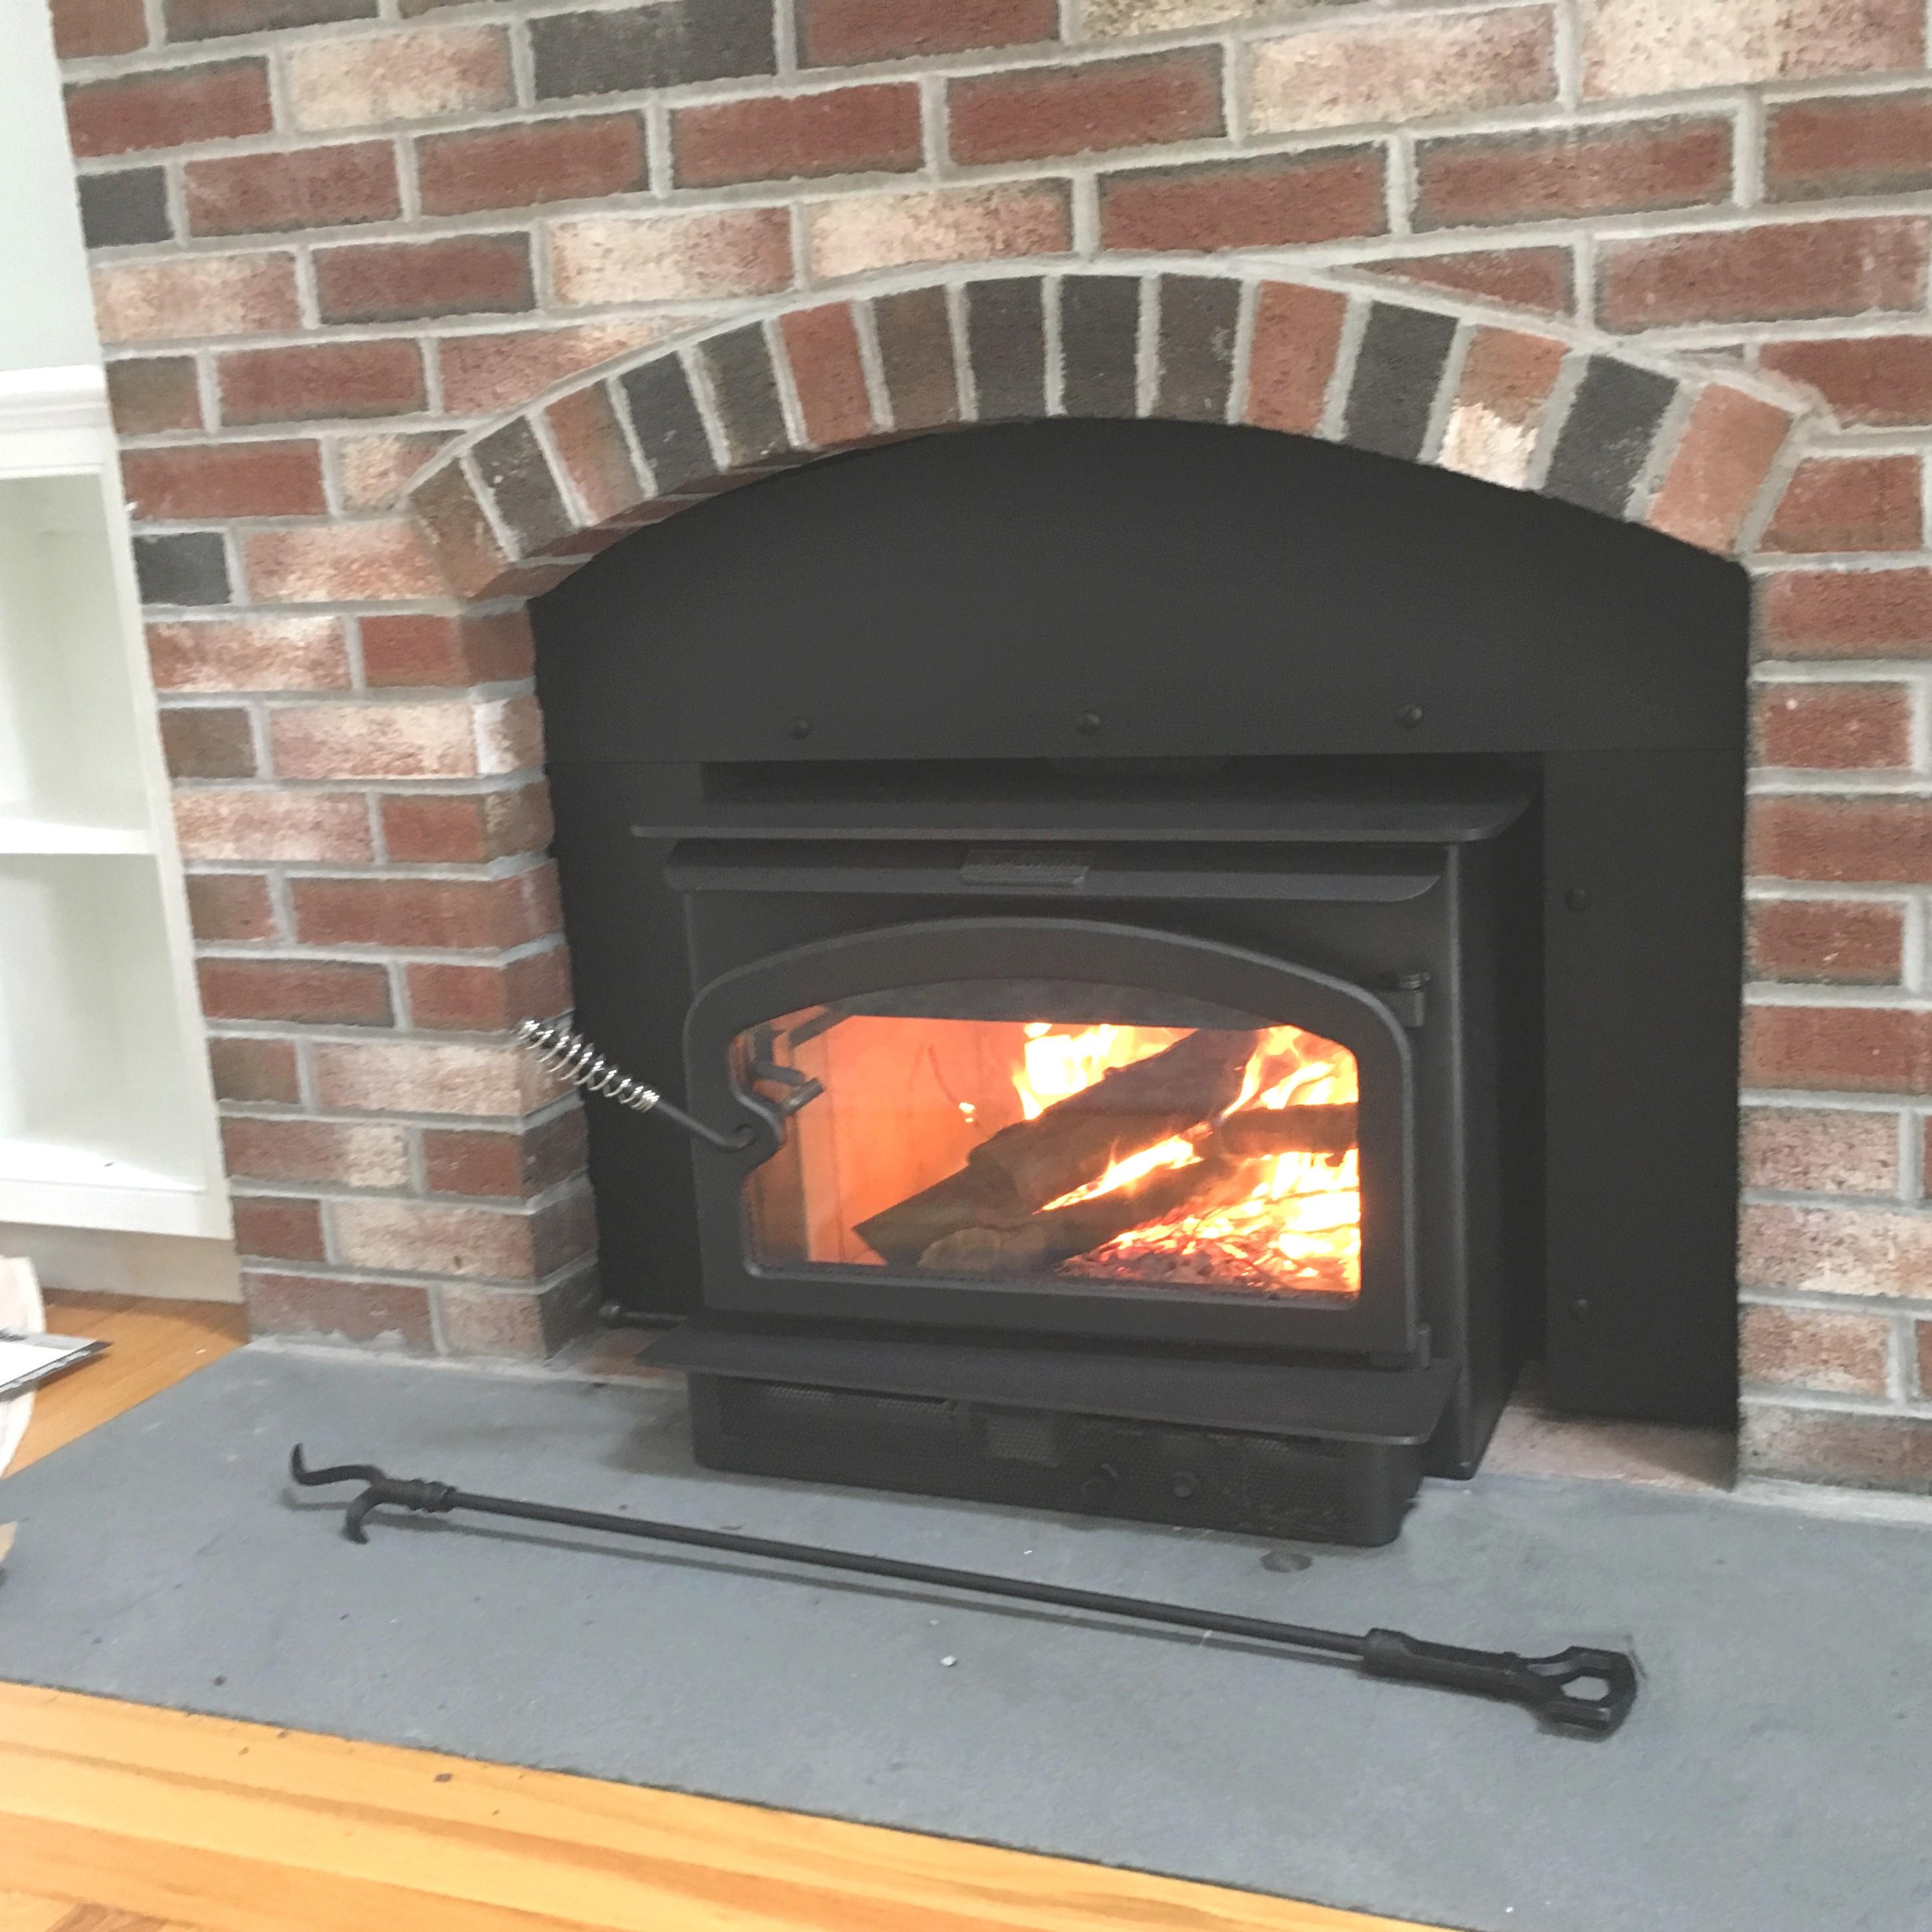 inserts en products wood performance fireplace appliance blower osburn burning insert